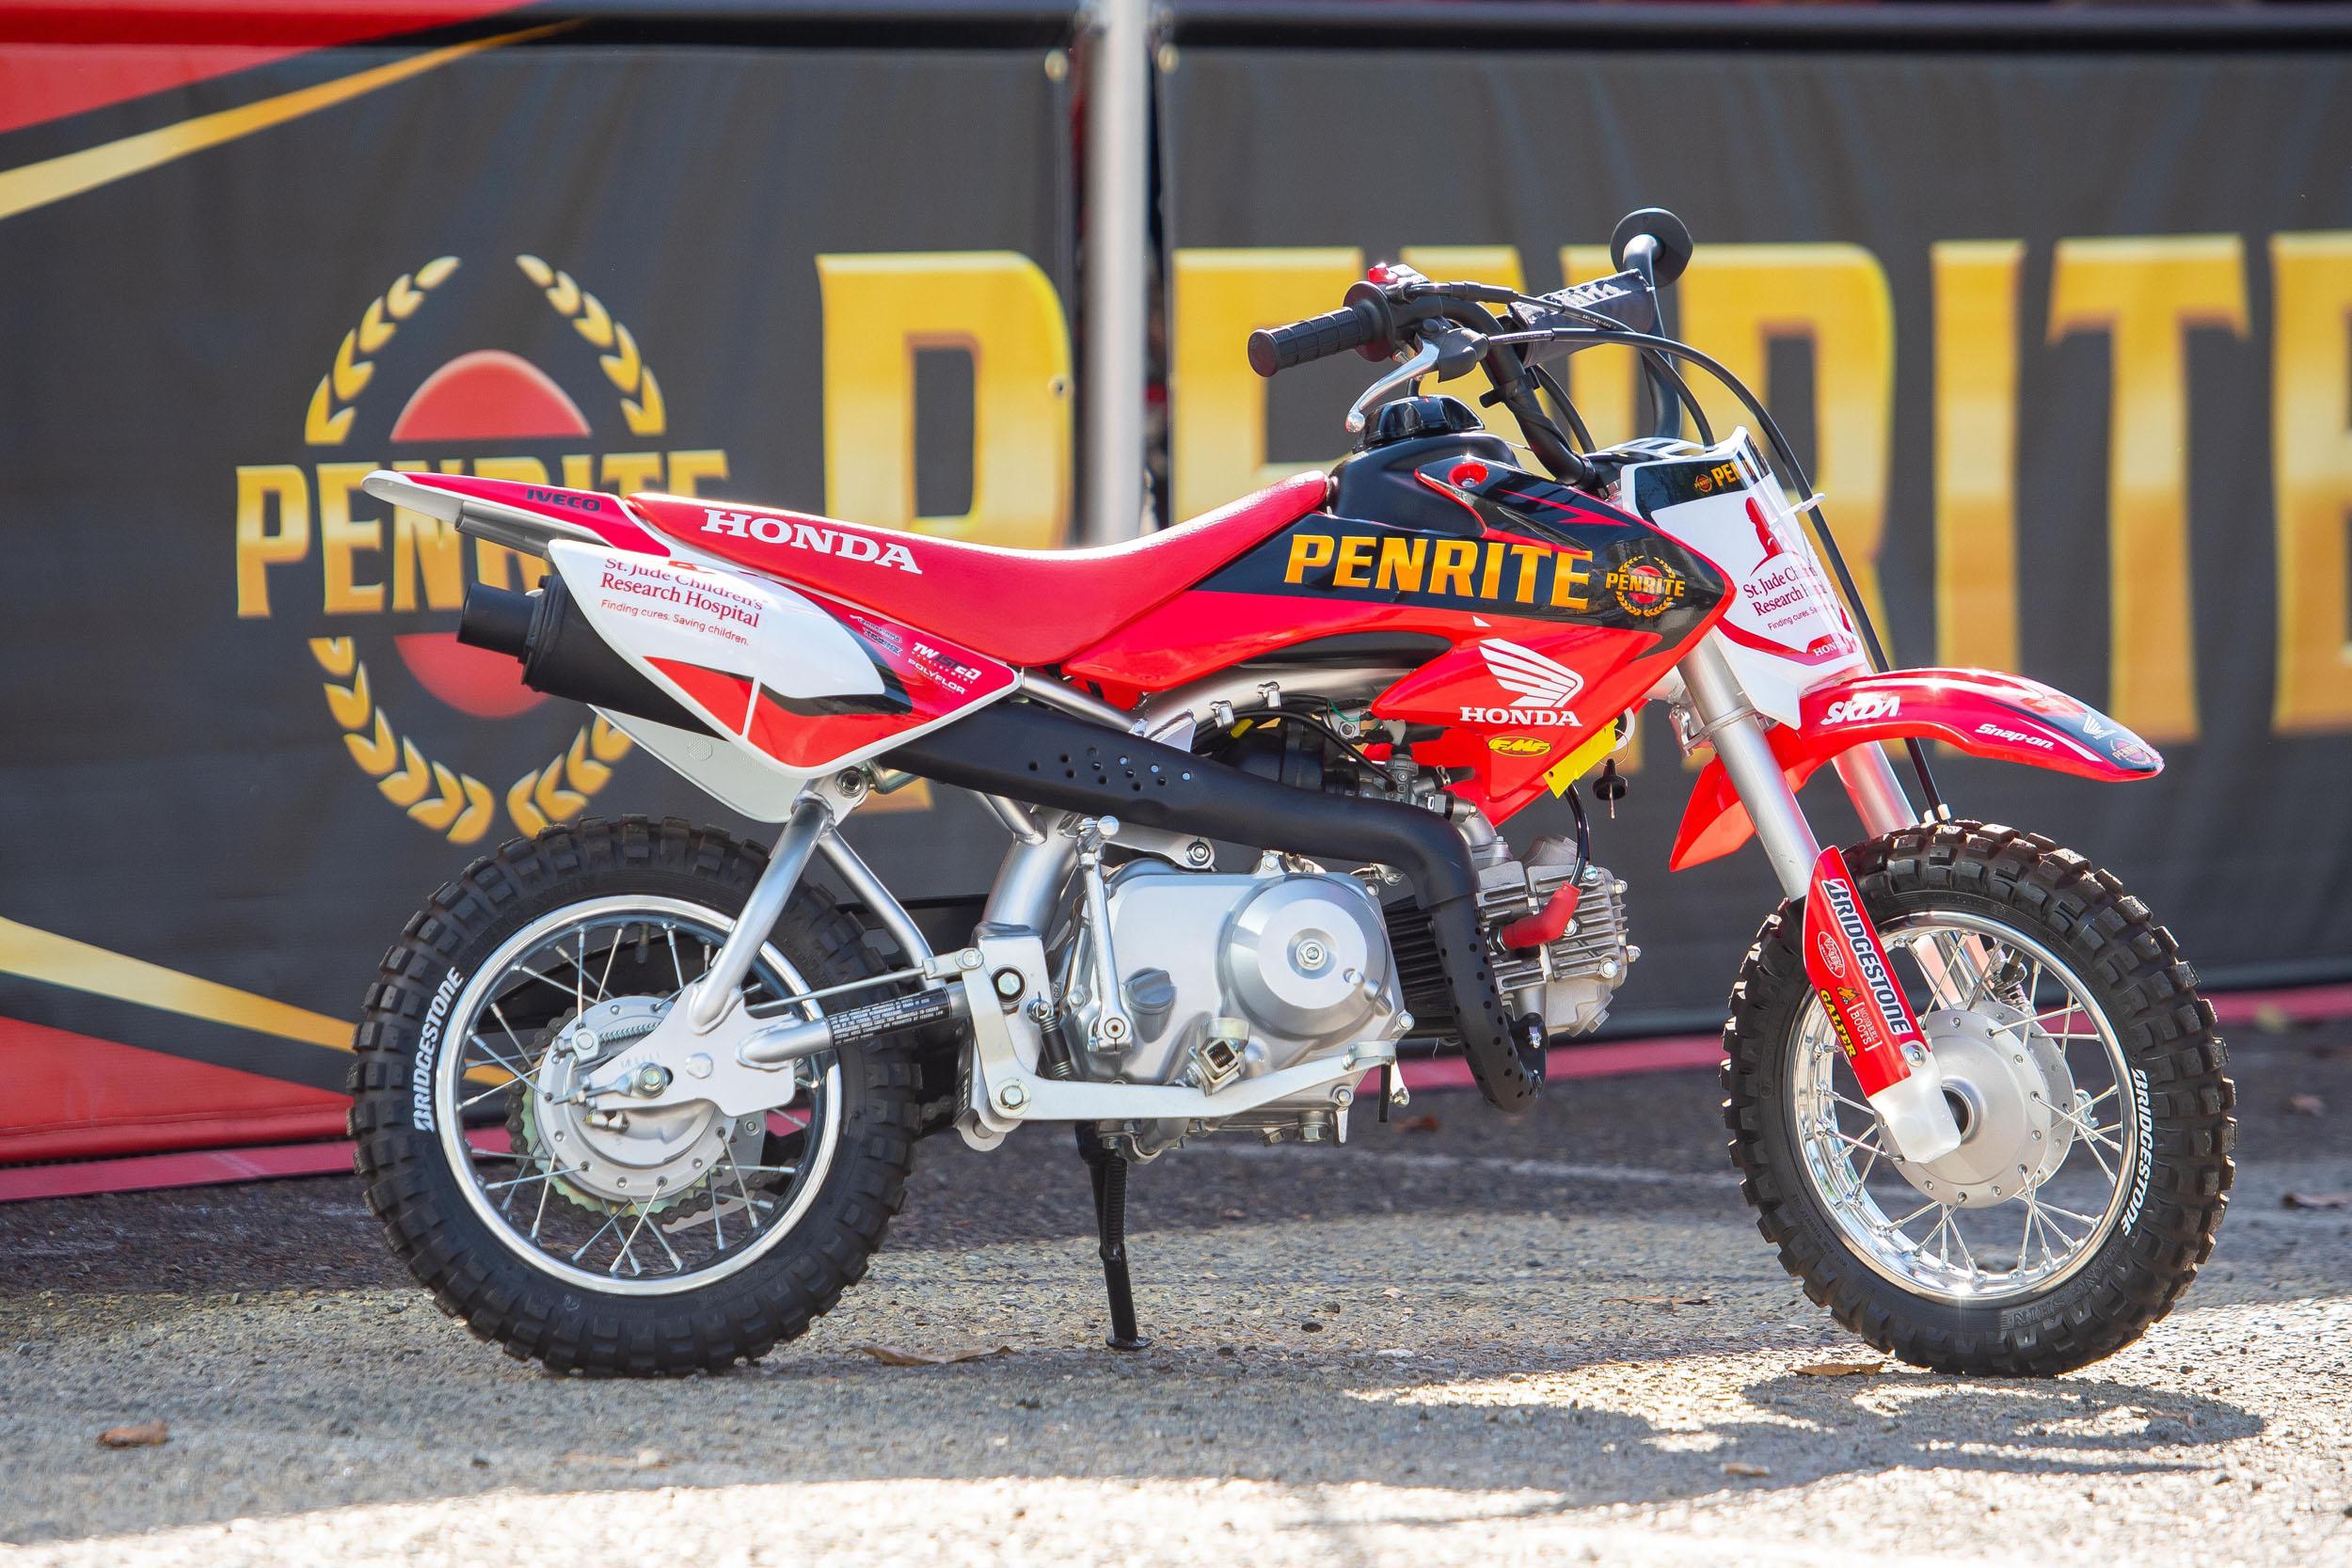 200501 St. Jude - Penrite Honda, competing in the Western Regional 250SX Class donated this Penrite Honda CRF50 team replica bike